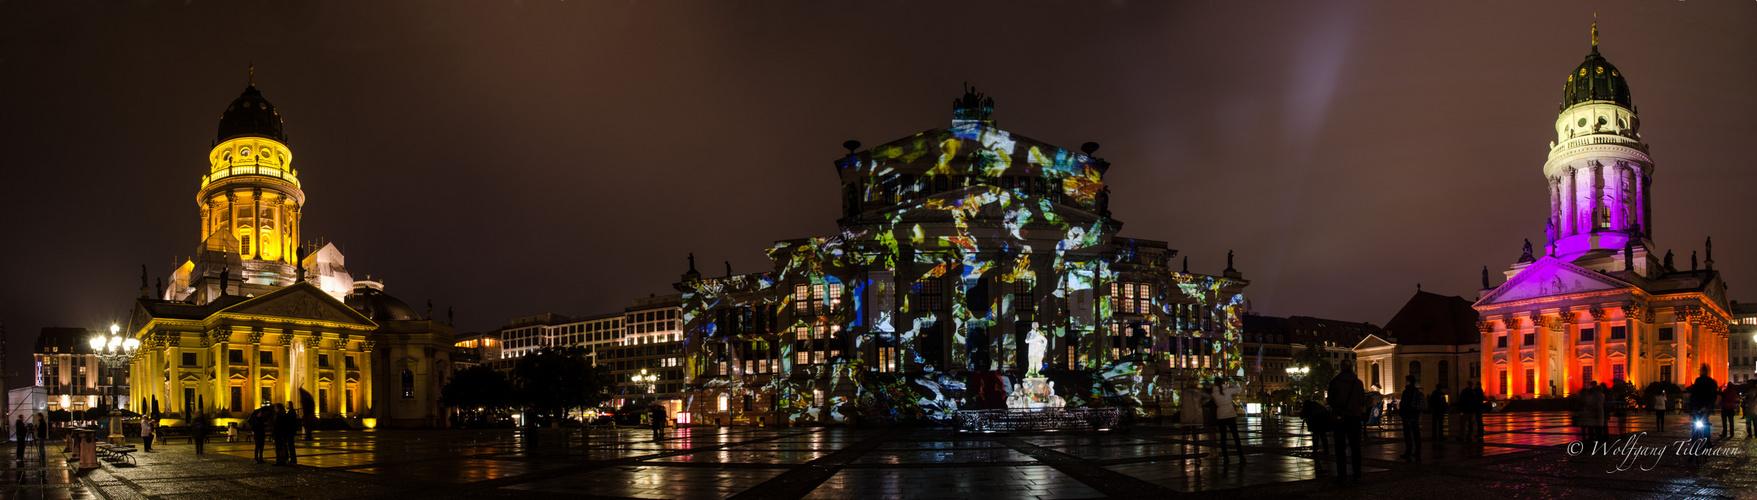 Festival of Lights 2012 - Gendarmenmarkt Berlin